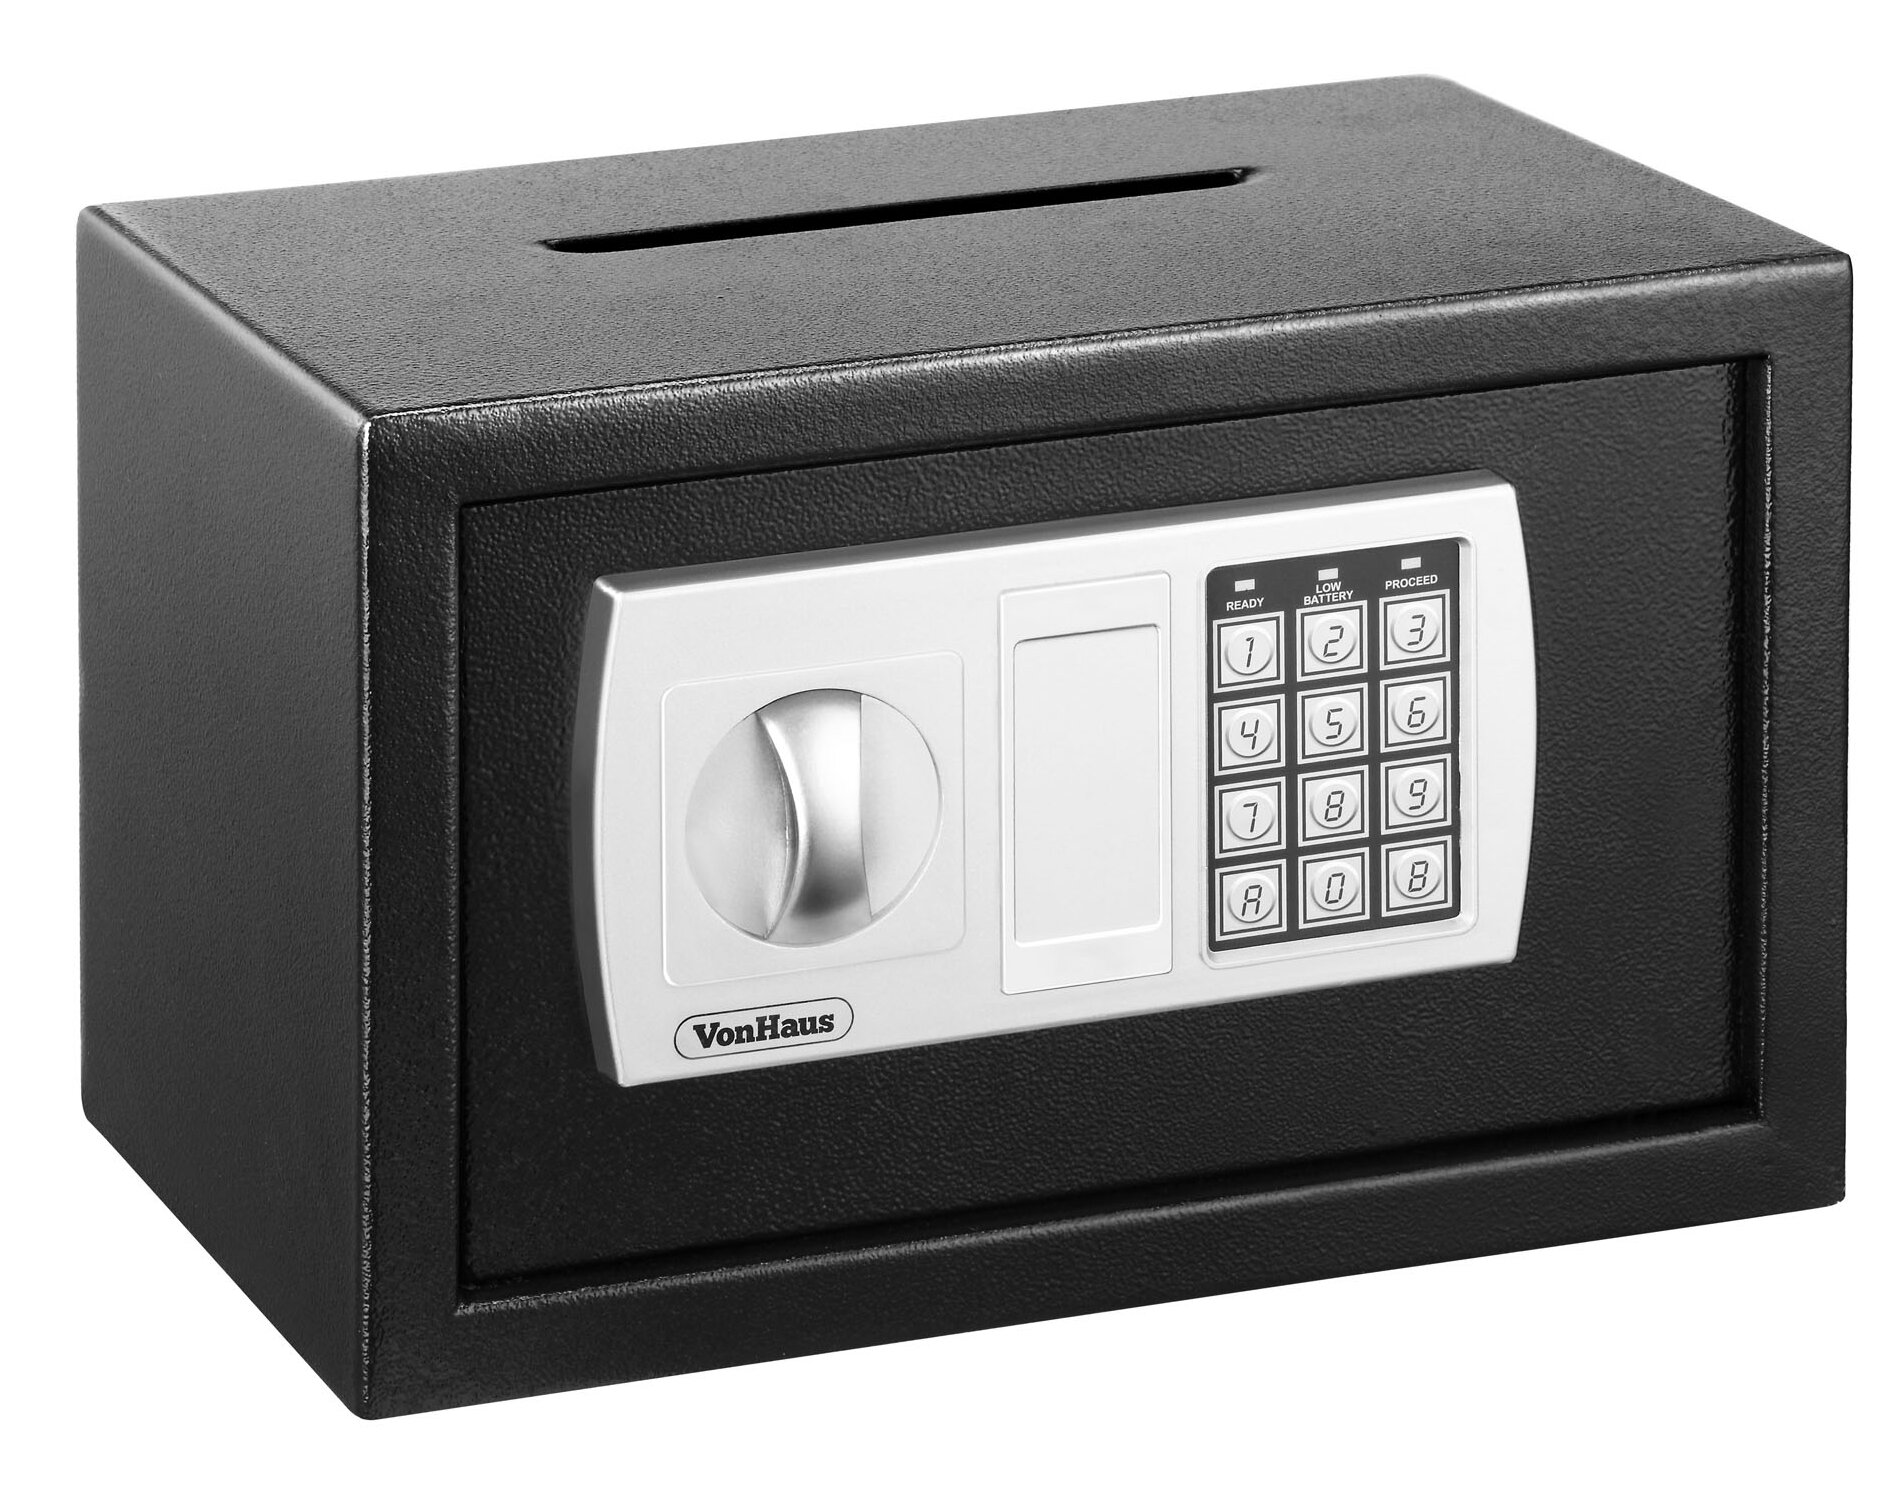 Electronic Digital Steel Security Safe Fireproof Lock Box Valuables Gun Docs